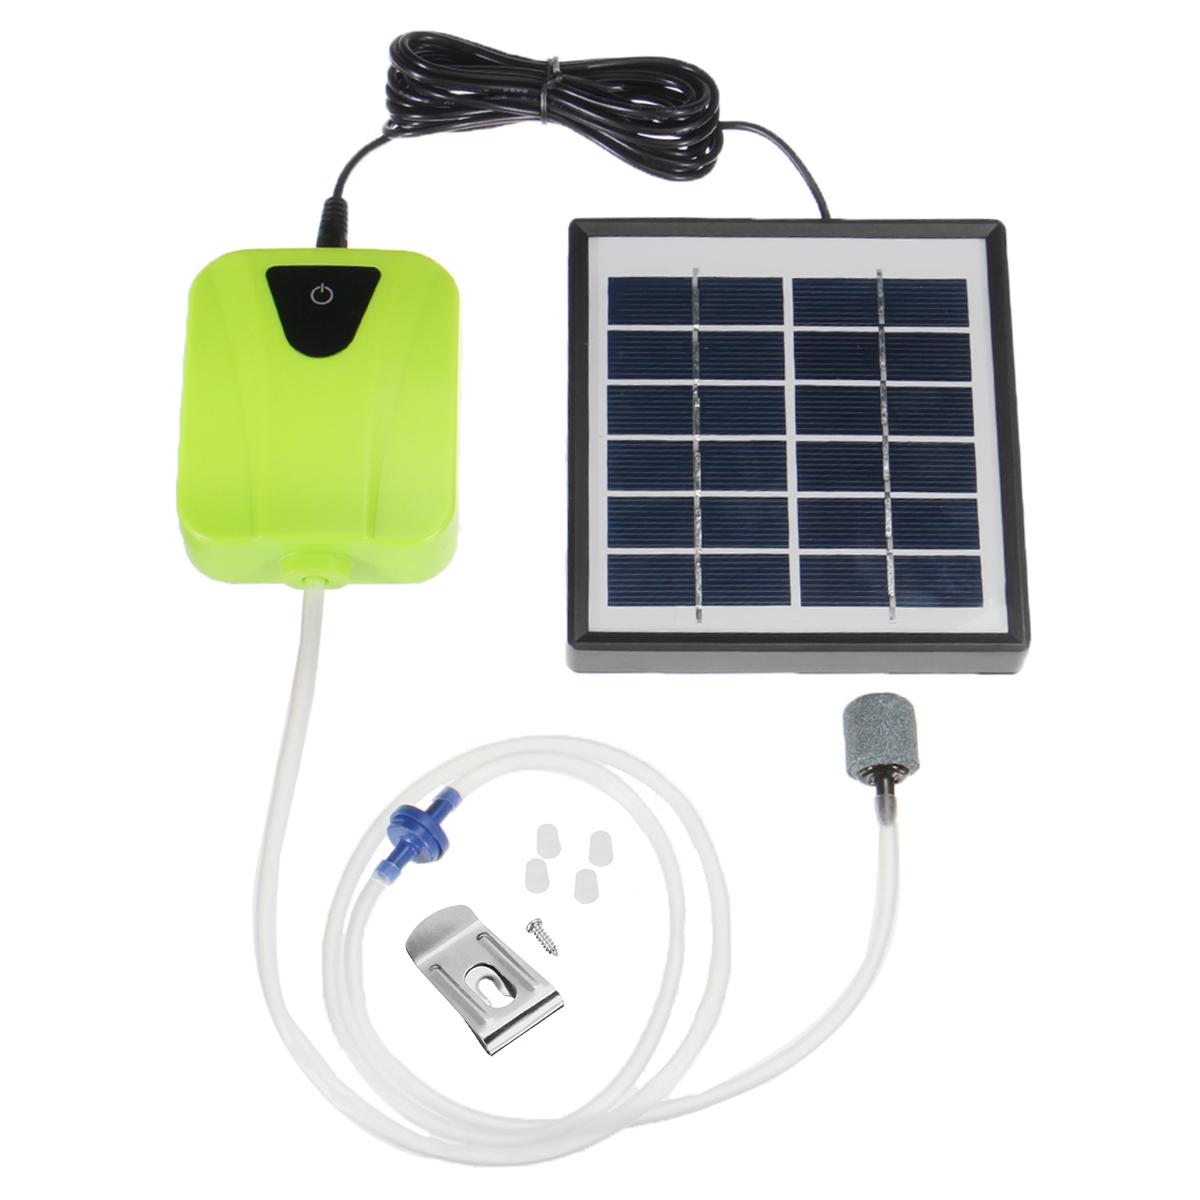 2 5w Oxygenator Air Pump Outdoor Solar Power Pond Aquarium